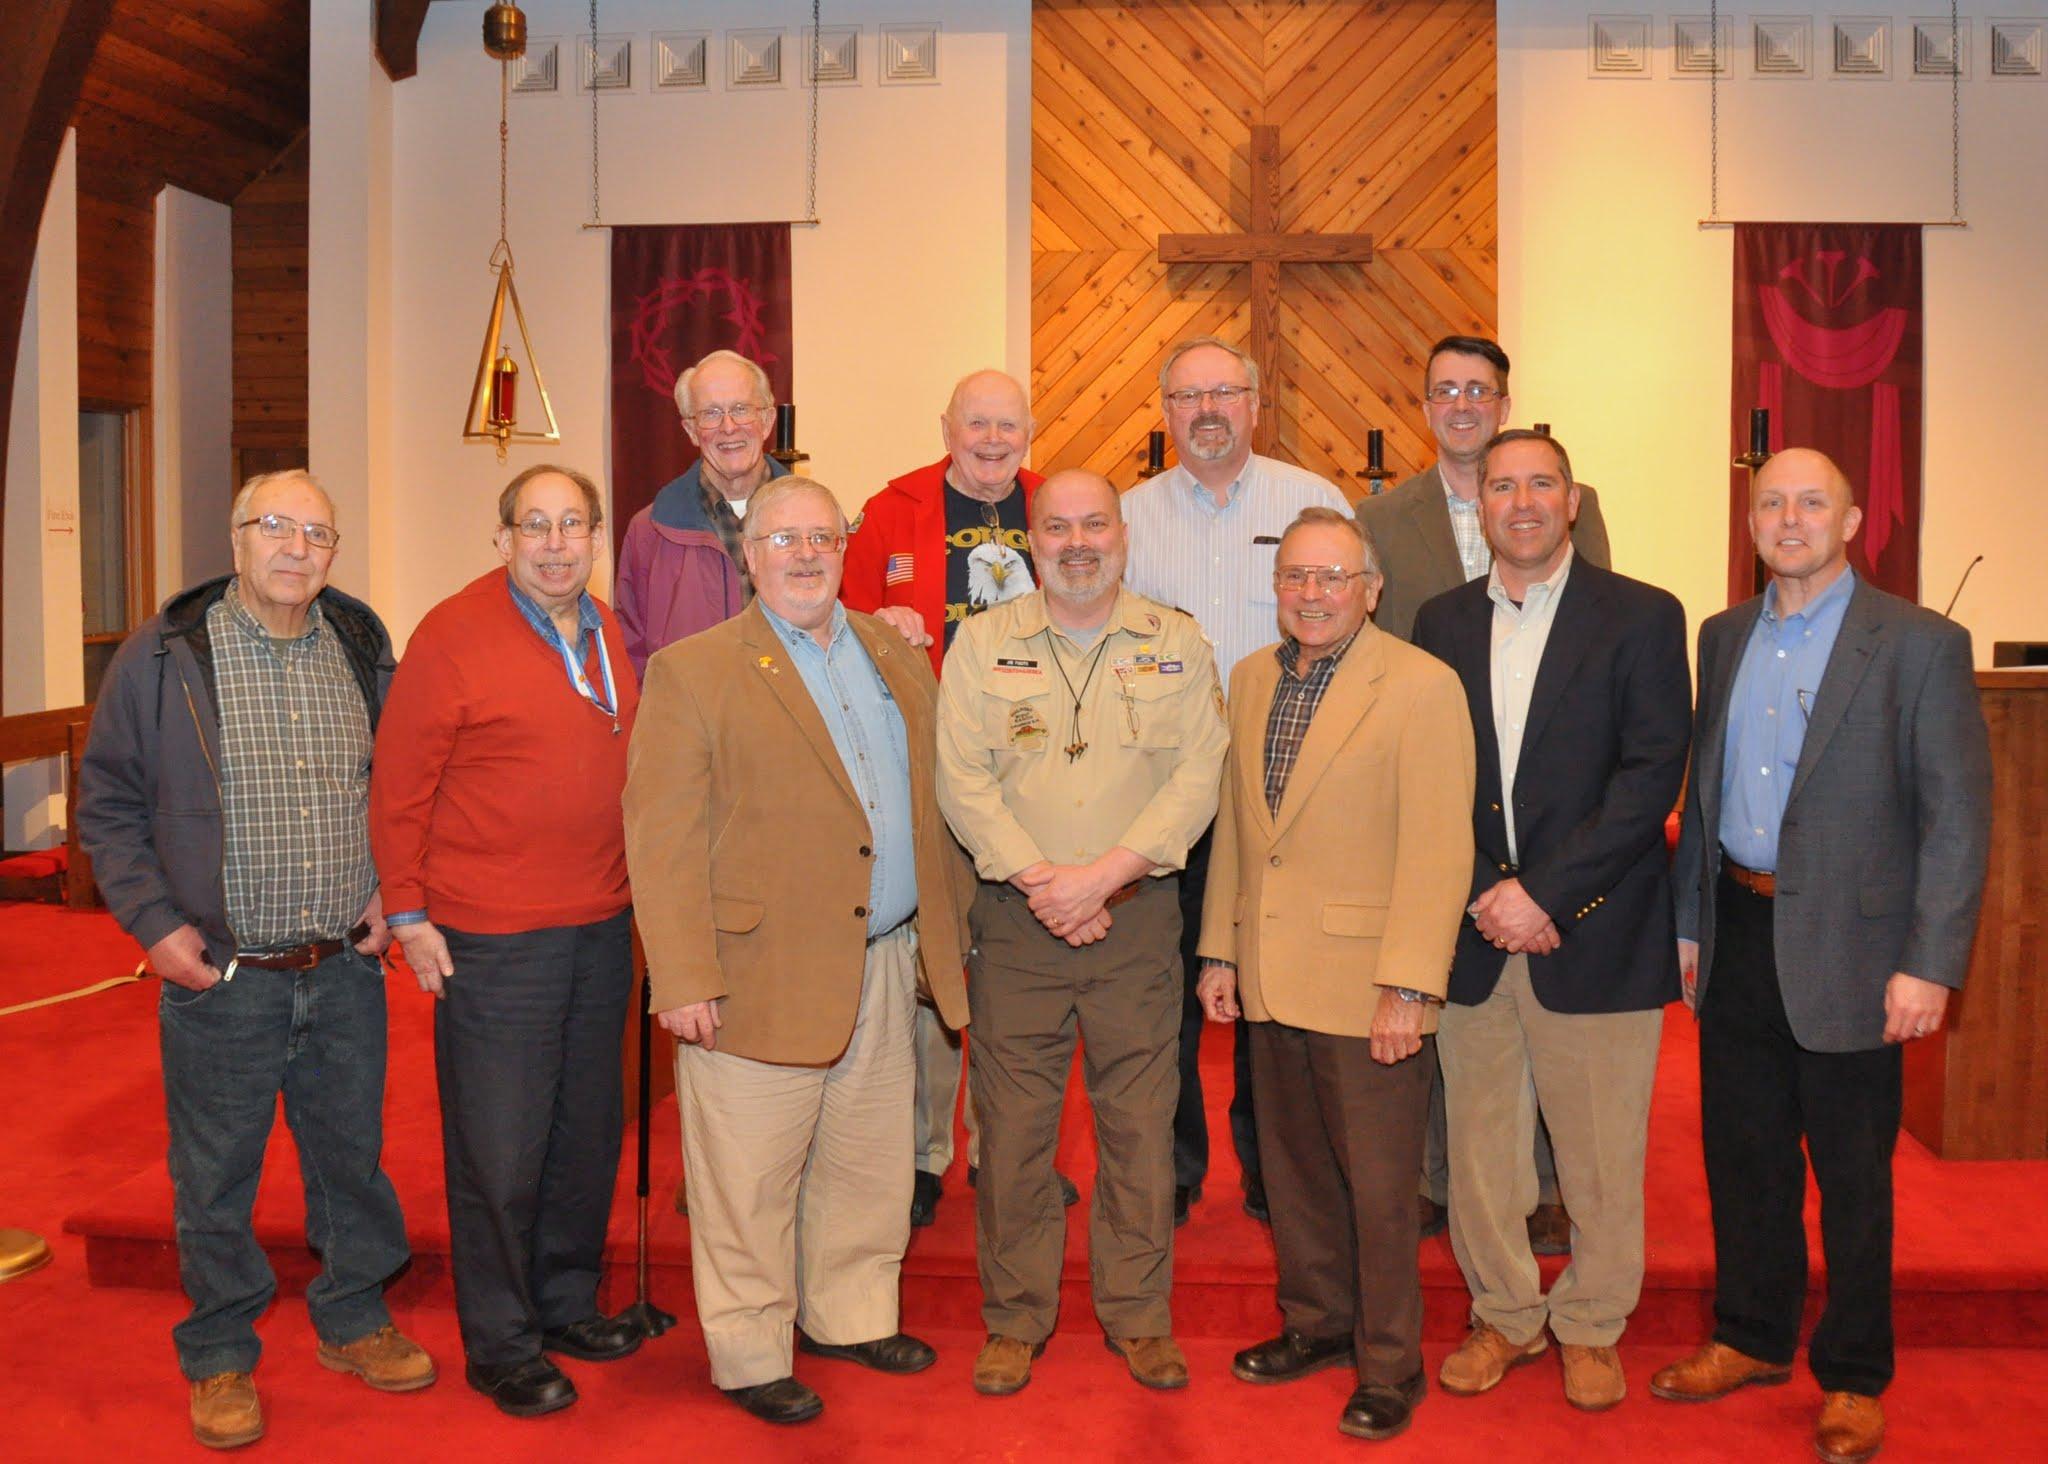 086c17f4c04abf80b239_Joe_with_Former_Troop_mates_and_Leaders.JPG